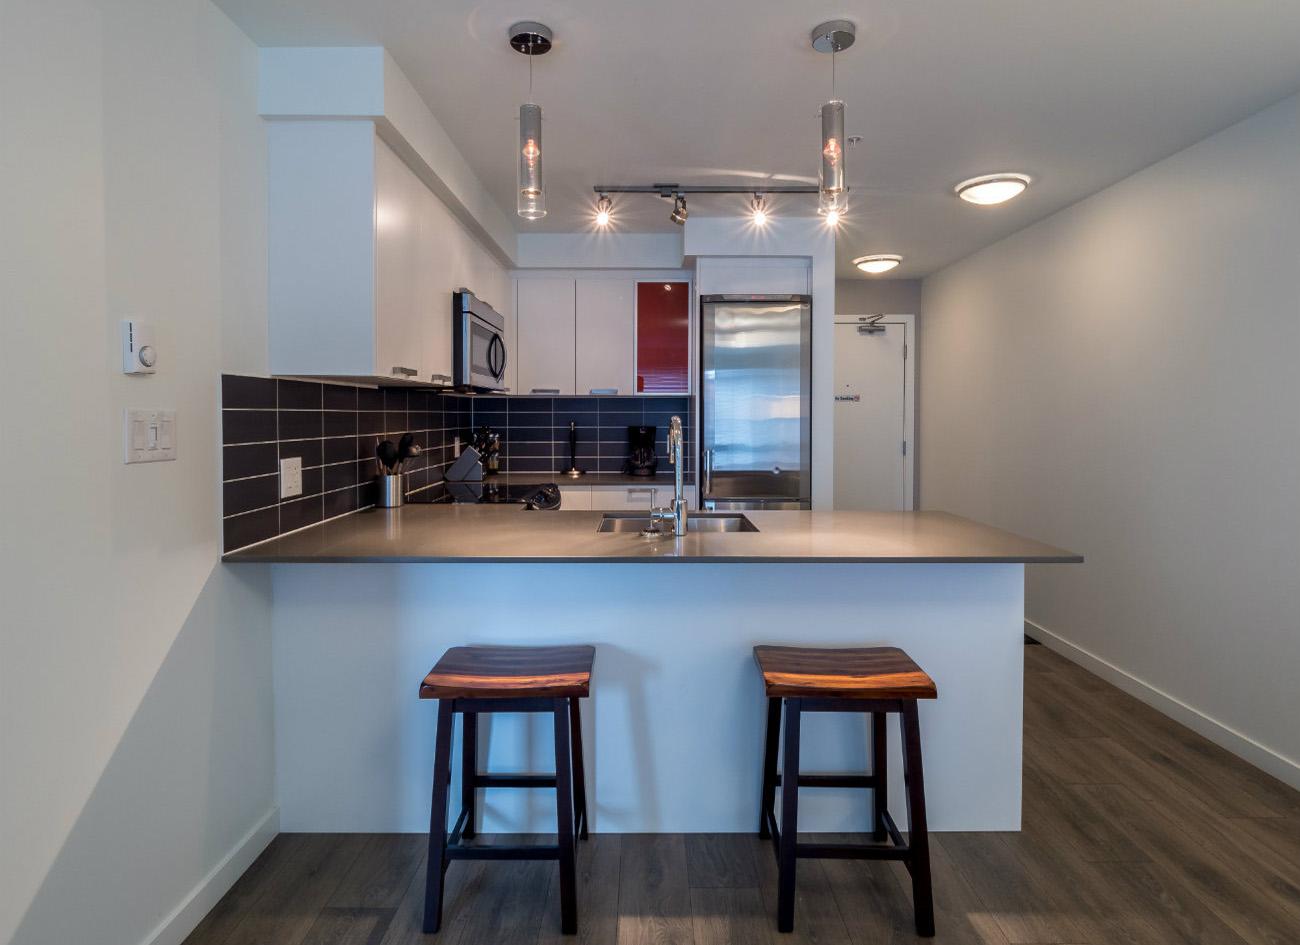 Union modern suites kitchen bar stools